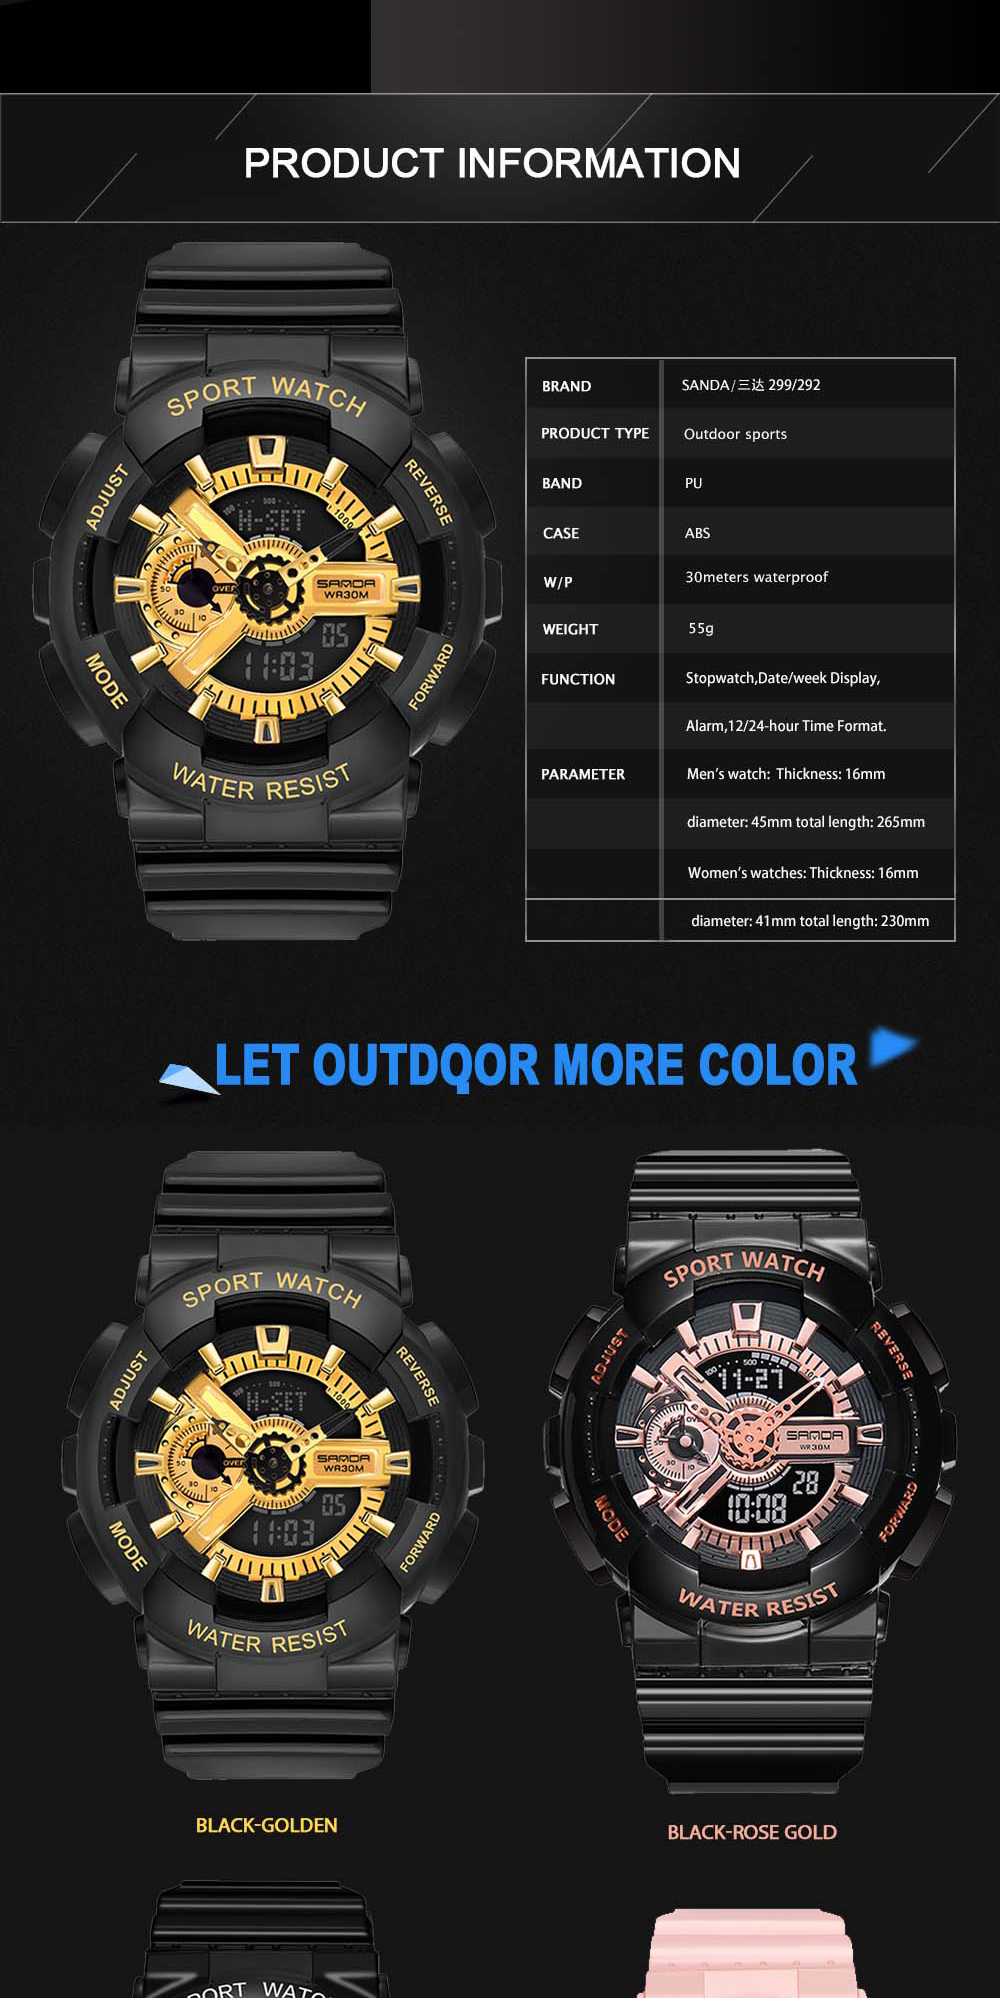 H6f09fa1c0d6c4600b2dd0601ab0bf4c7k 2020 SANDA Military Men's Watch Brand Luxury Waterproof Sport Wristwatch Fashion Quartz Clock Couple Watch relogio masculino